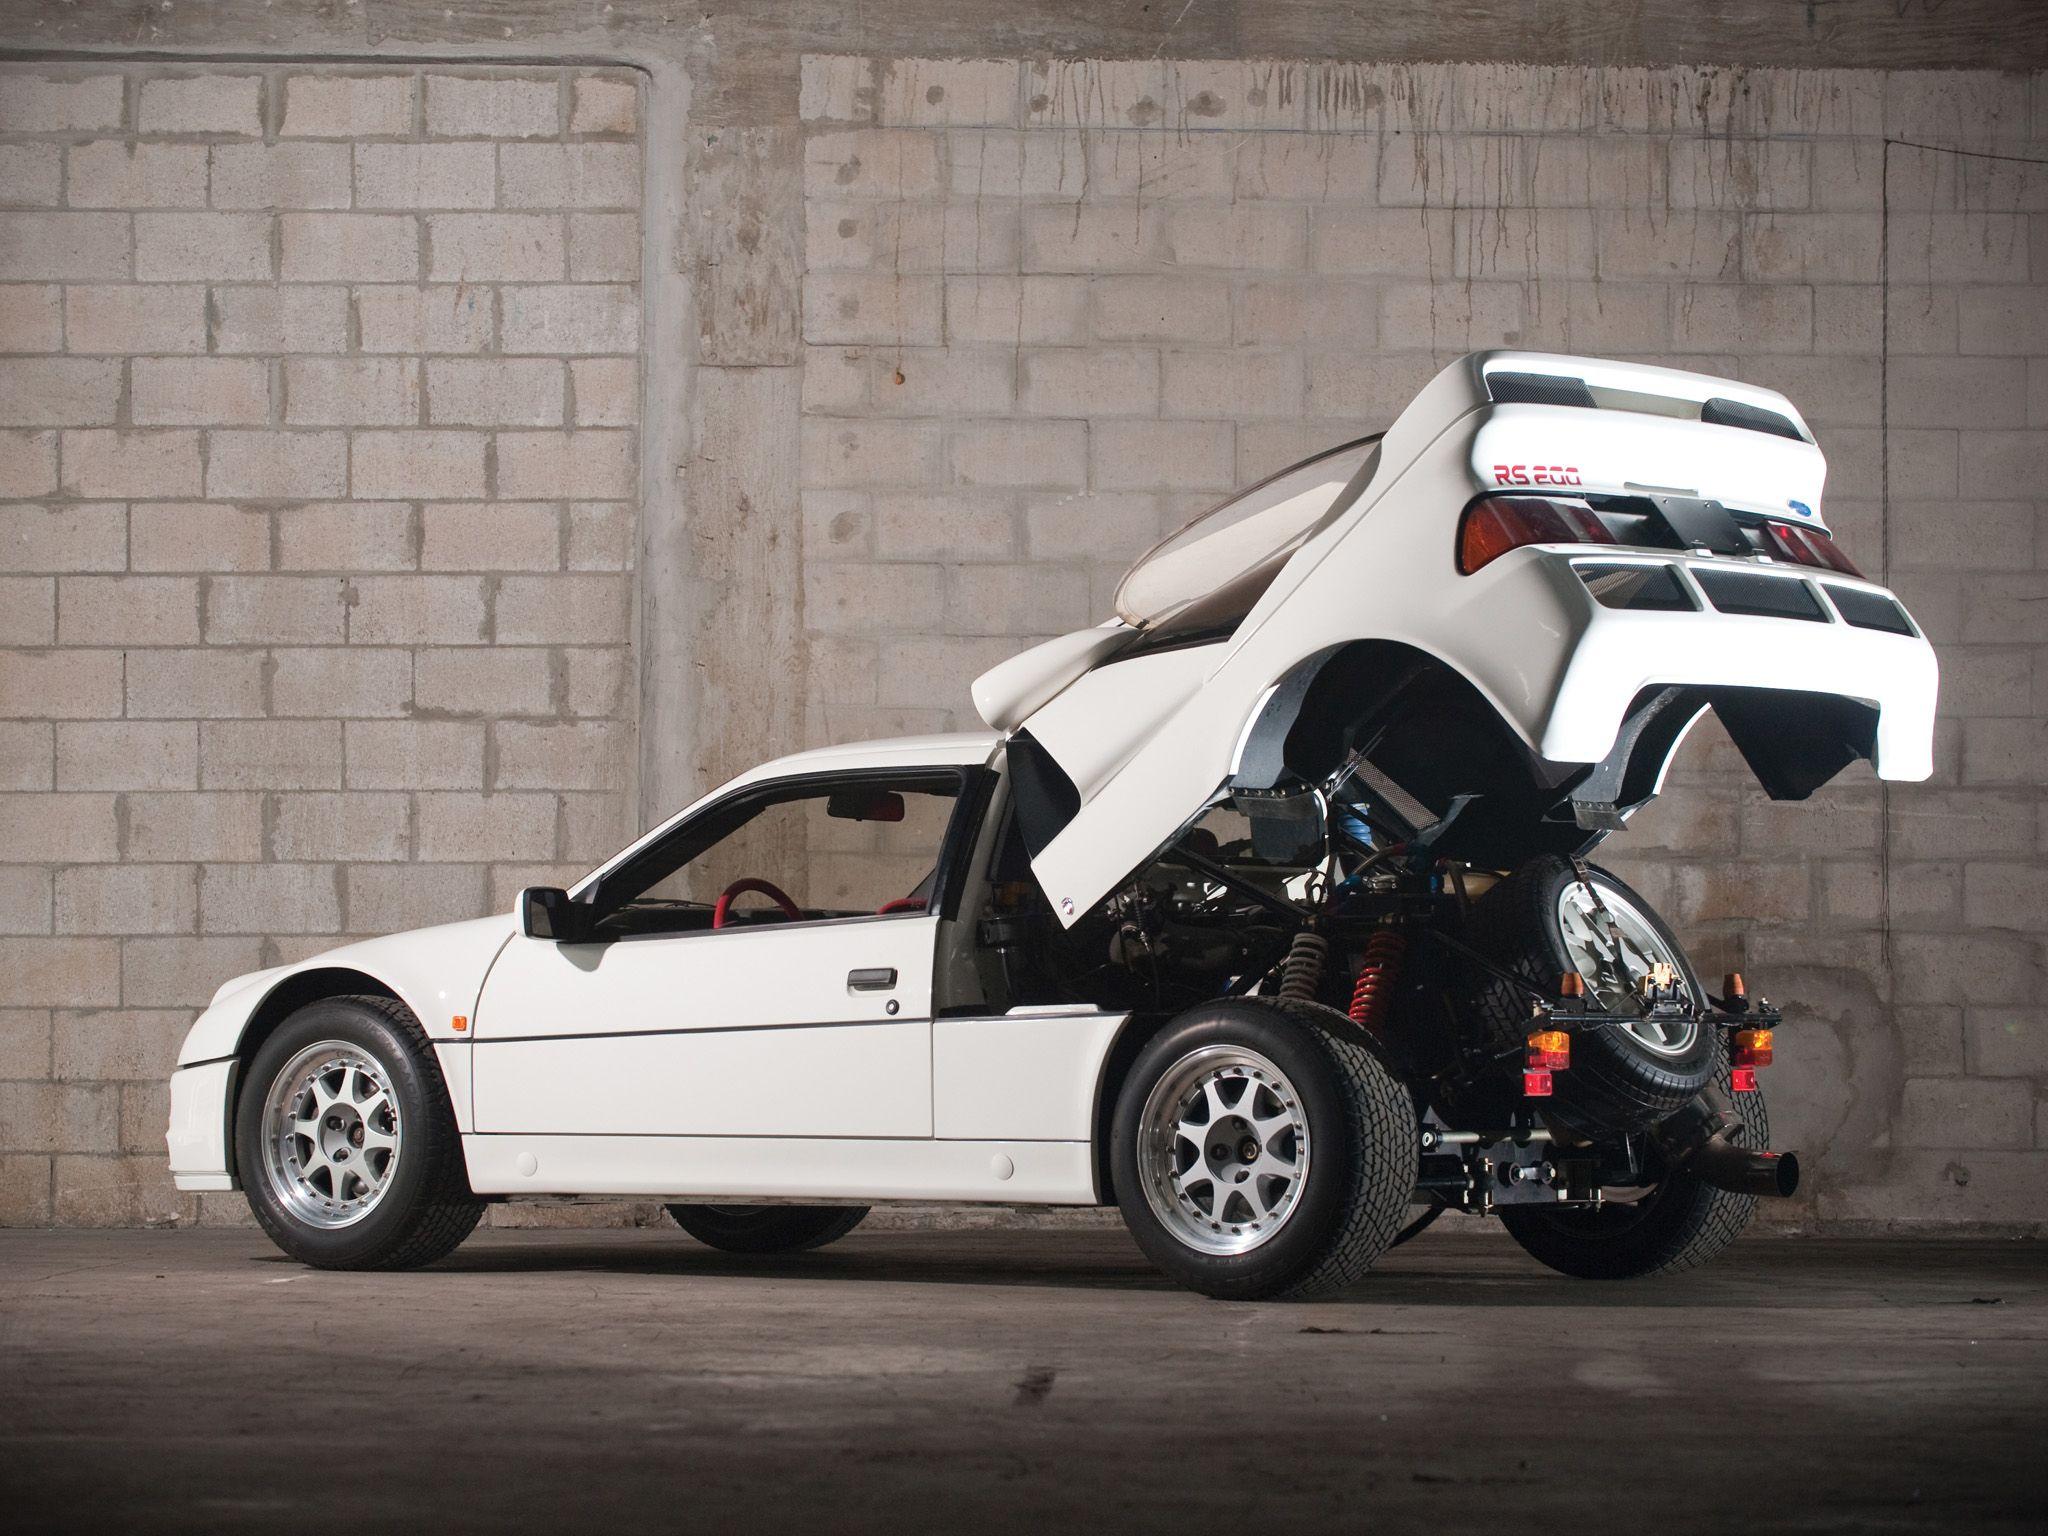 1984 86 Ford Rs200 Evolution